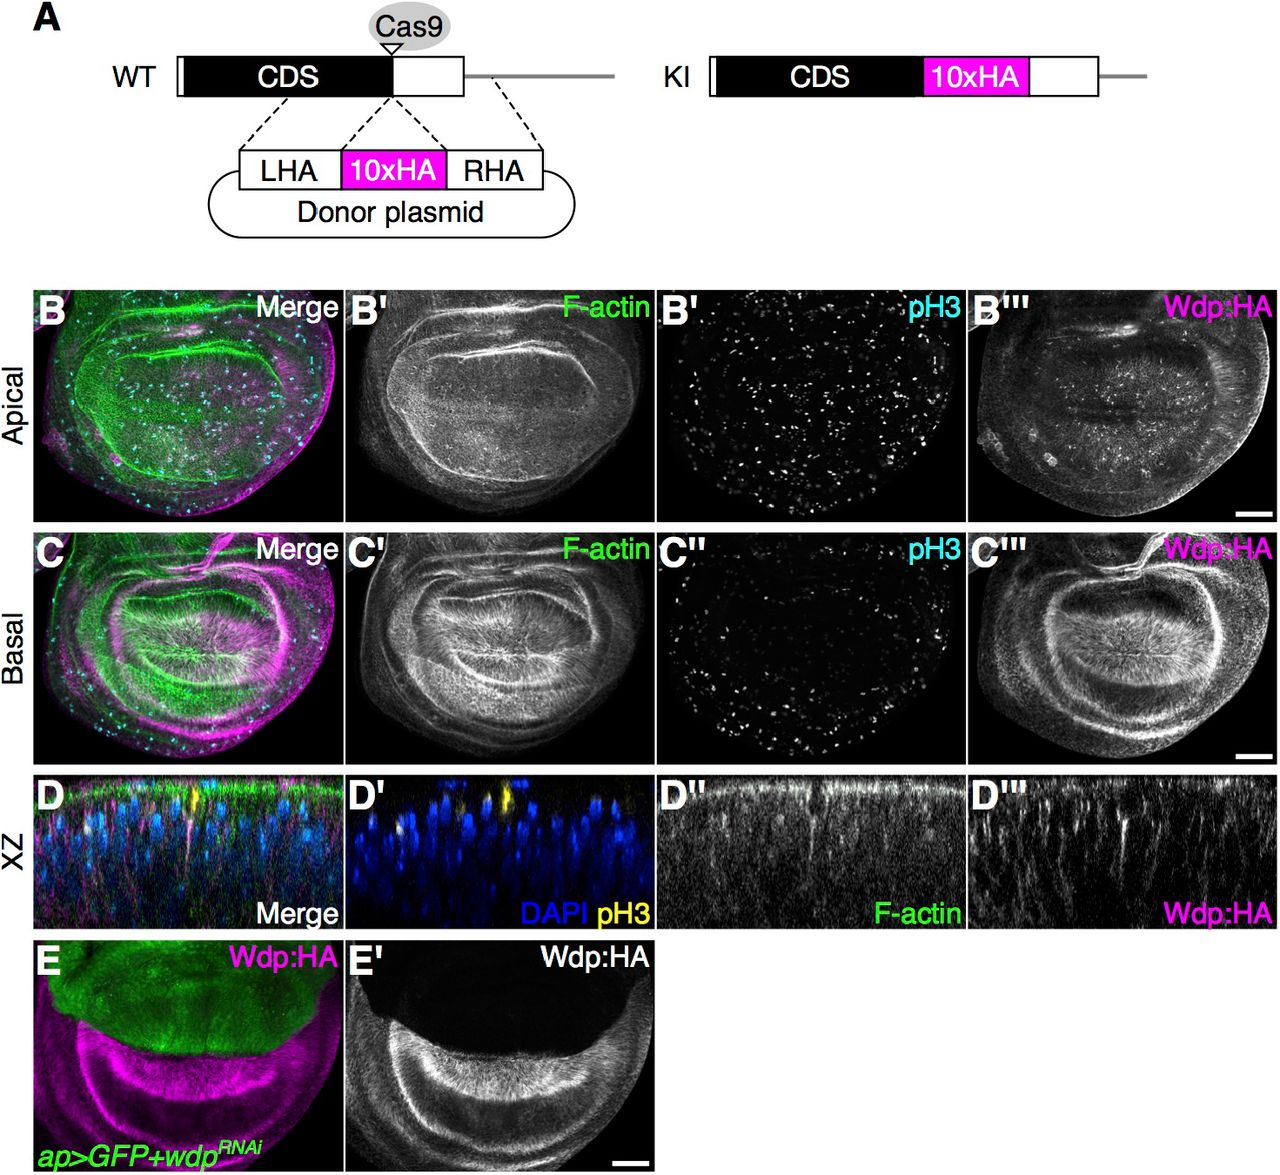 Chondroitin sulfate proteoglycan Windpipe modulates Hedgehog